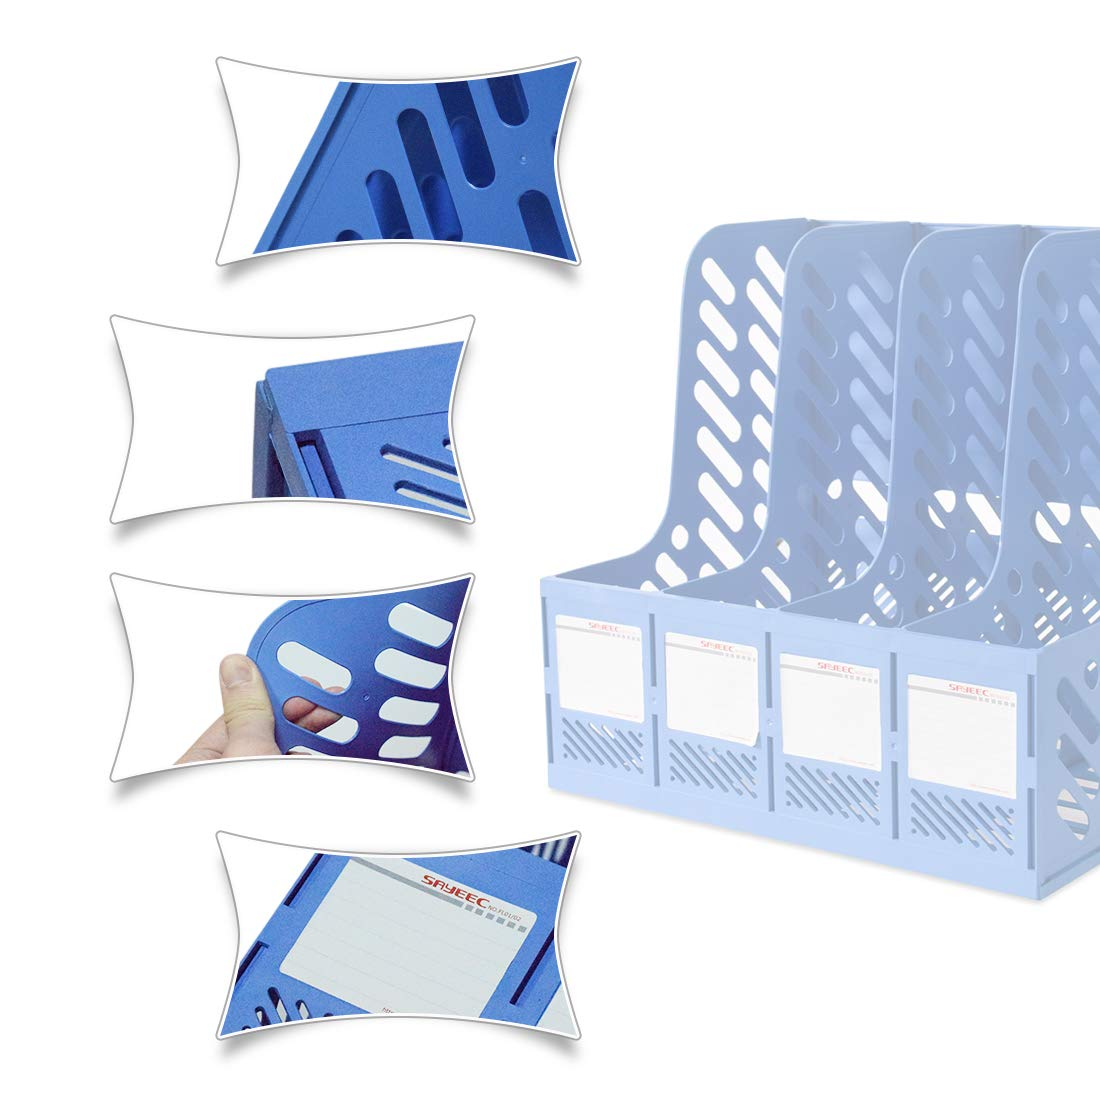 Marte Vanci 4 Sections Sturdy Plastic Magazine Holder Frames File Dividers Cabinet Rack Paper Document Office School Desk Organiser with A4 File Bag Bonus Blue